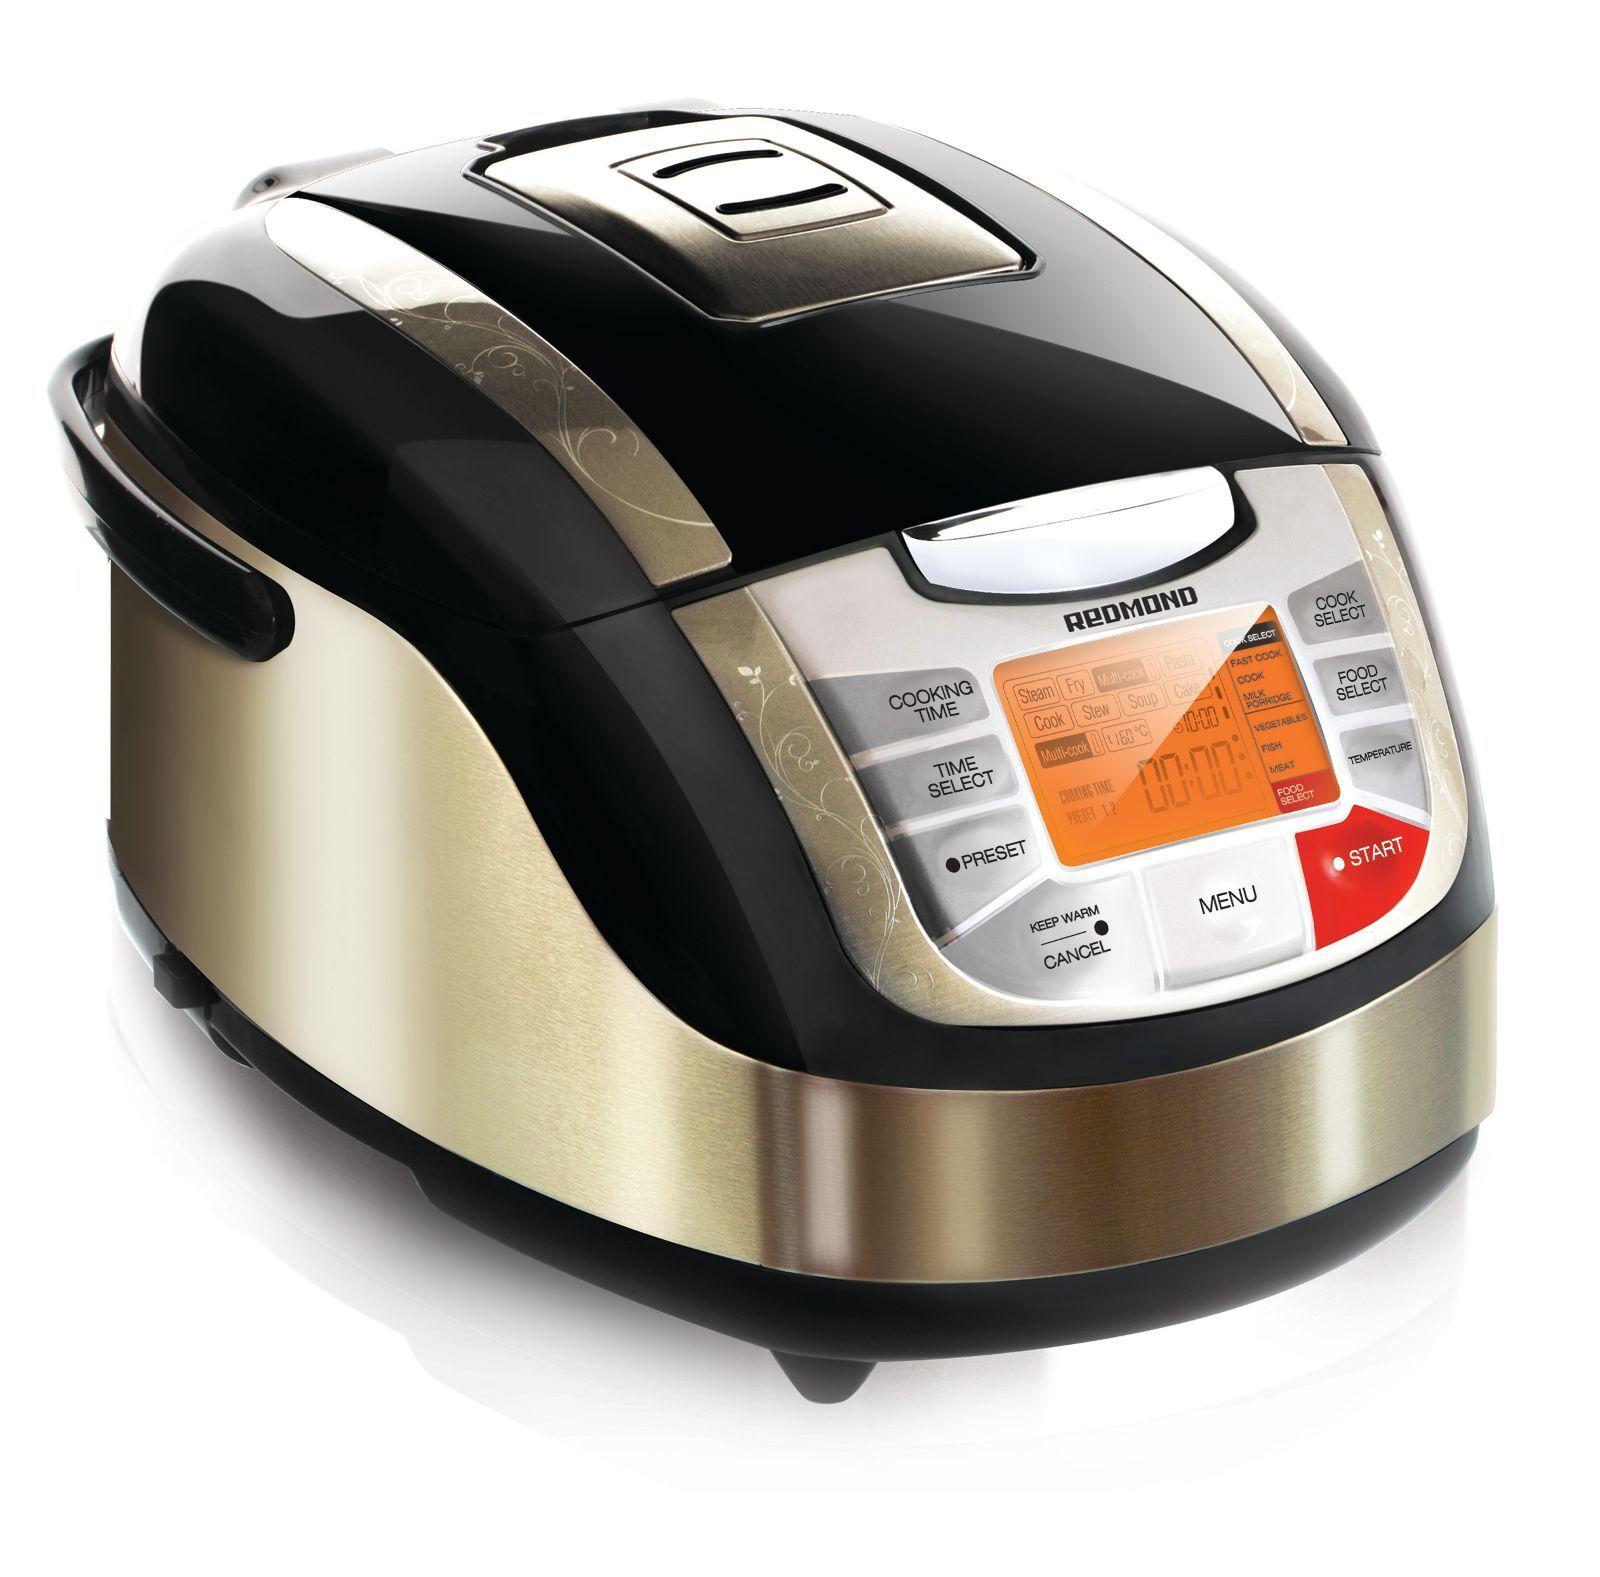 rougemond rmc-m4502e Multi réchaud simplement cuisiner multivarka multiwarka multicooker